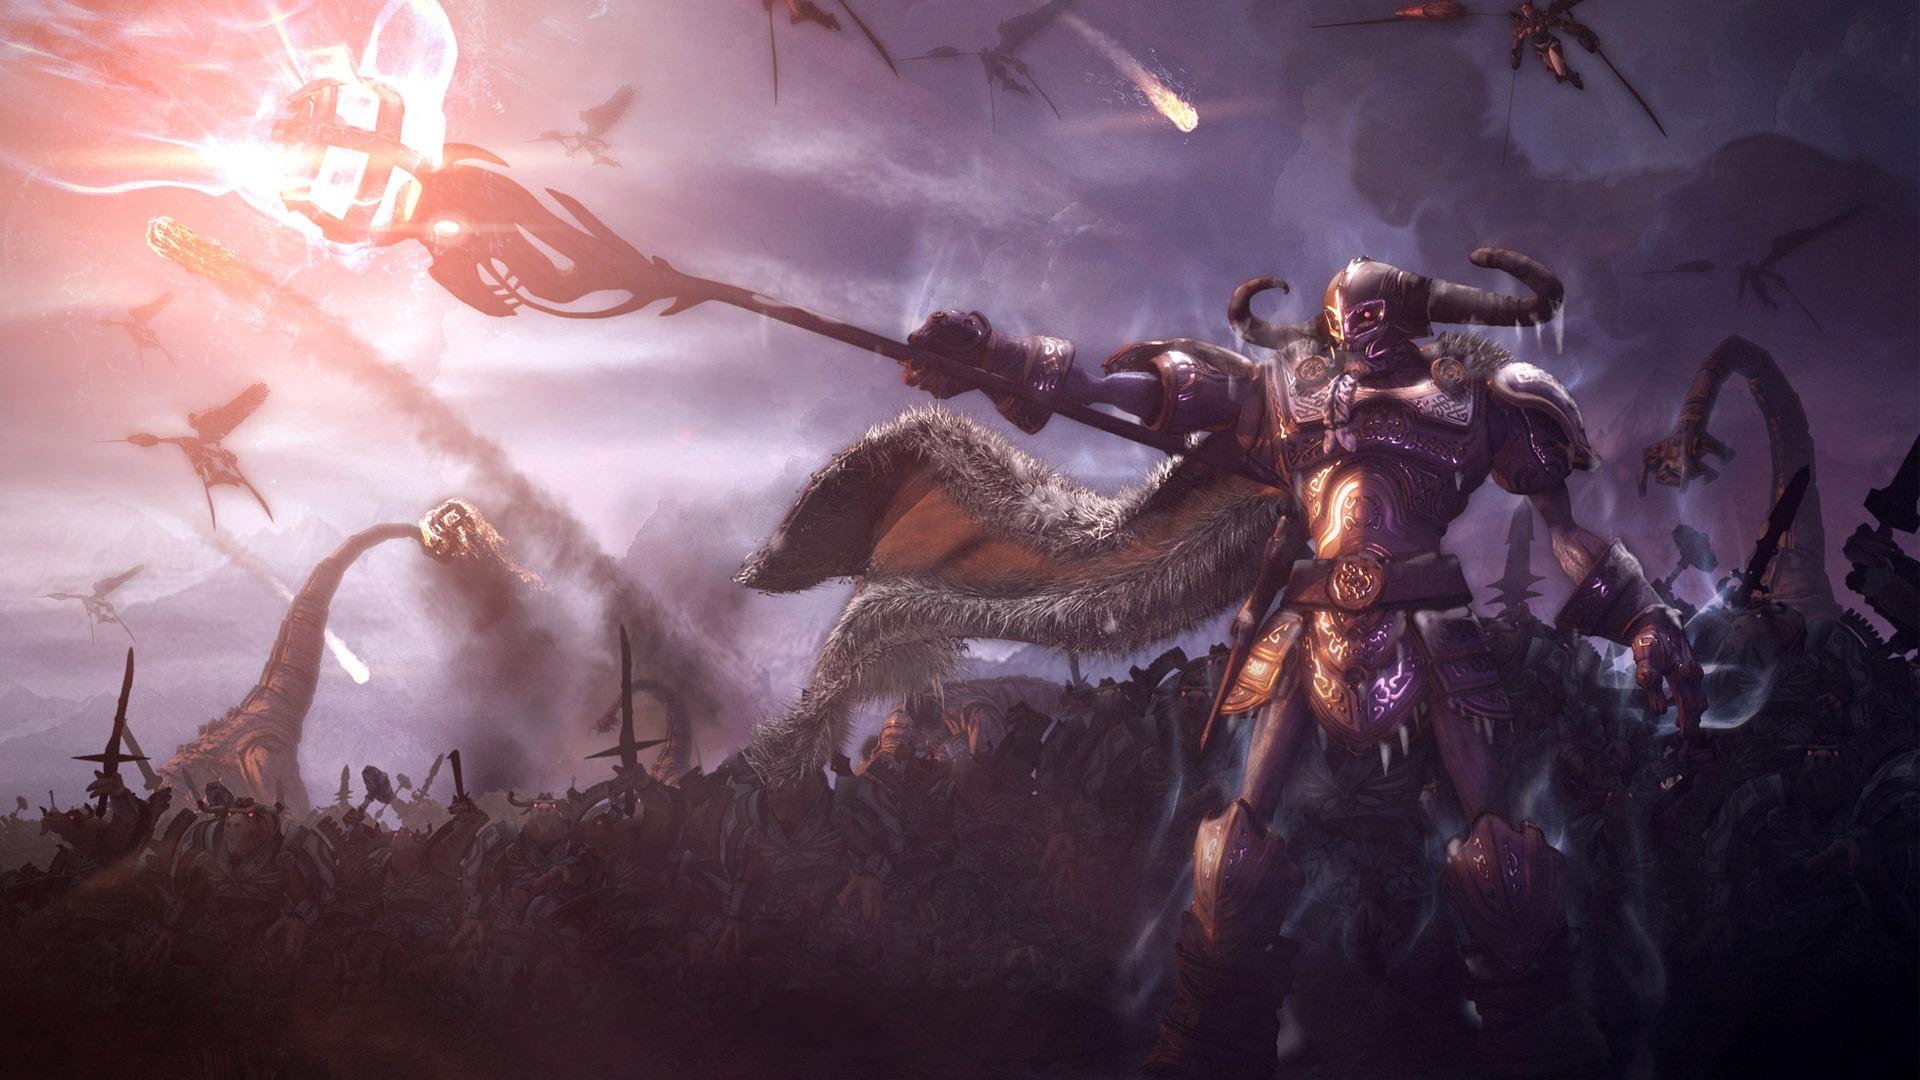 Fantasy Battle Art wallpaper